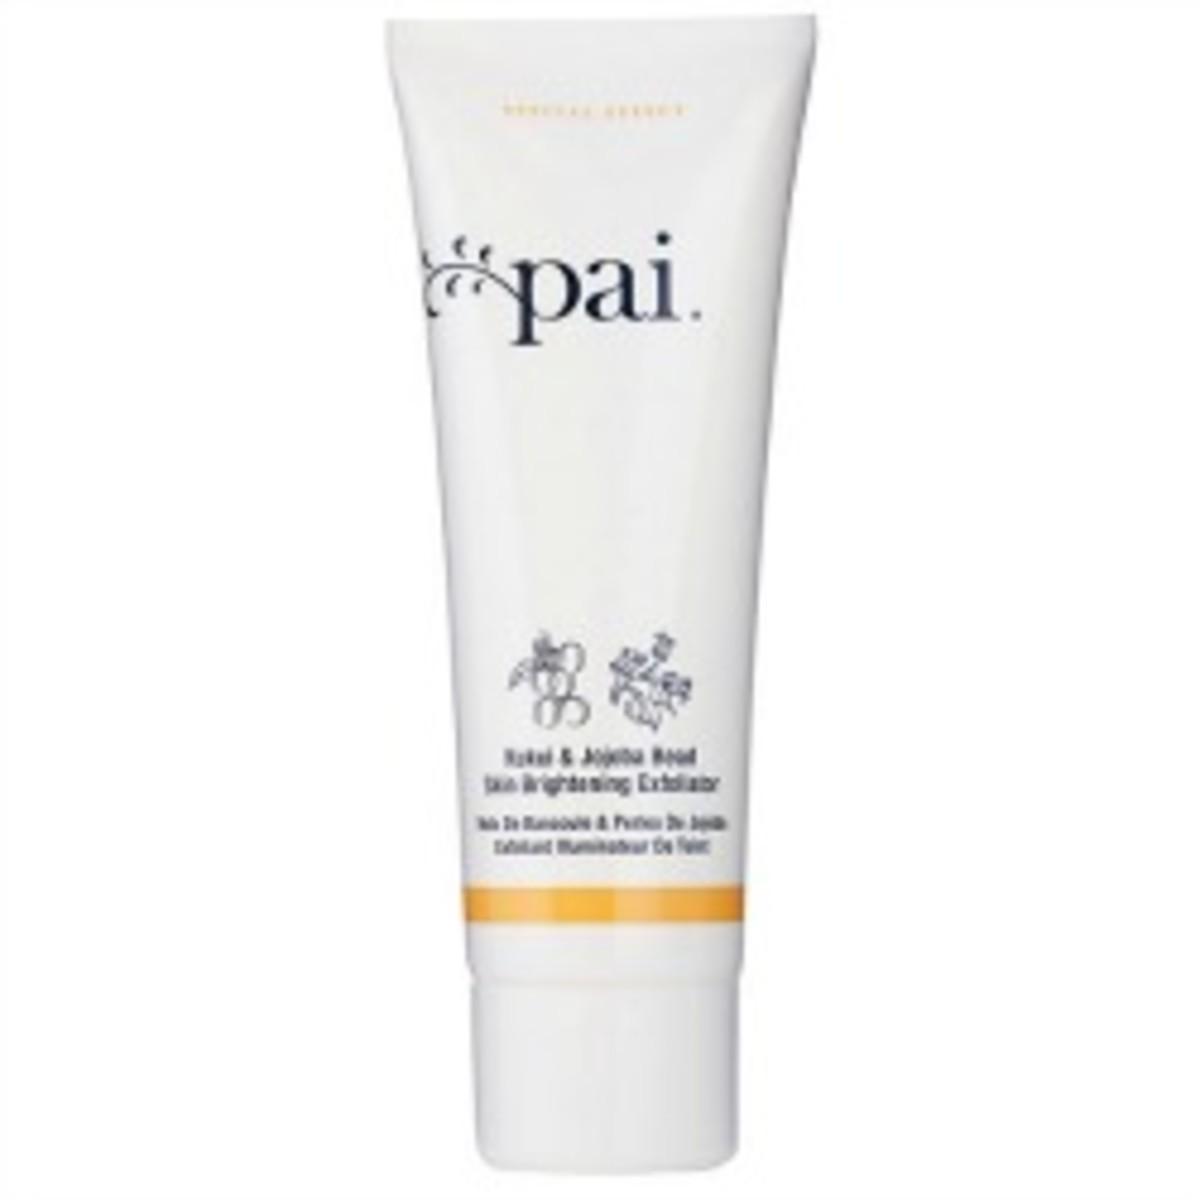 Pai Skincare Kukui & Jojoba Skin Brightening Exfoliator